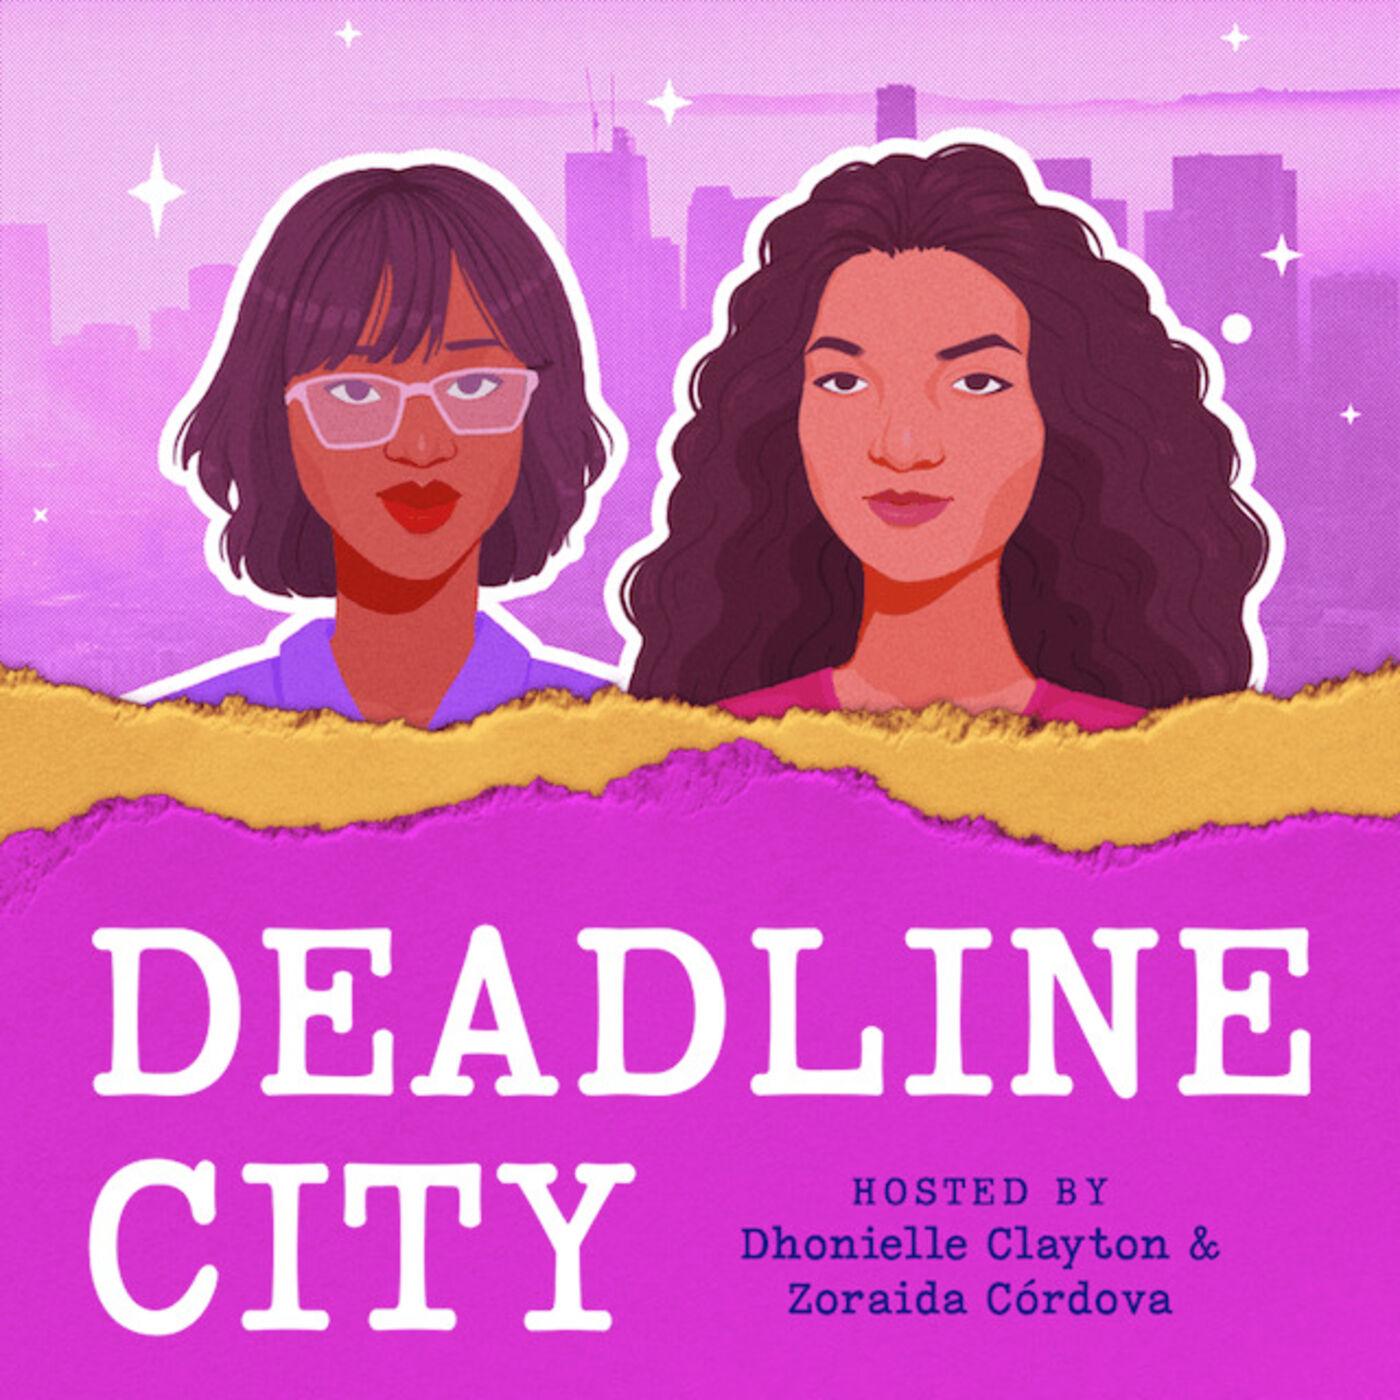 Deadline City's Podcast podcast